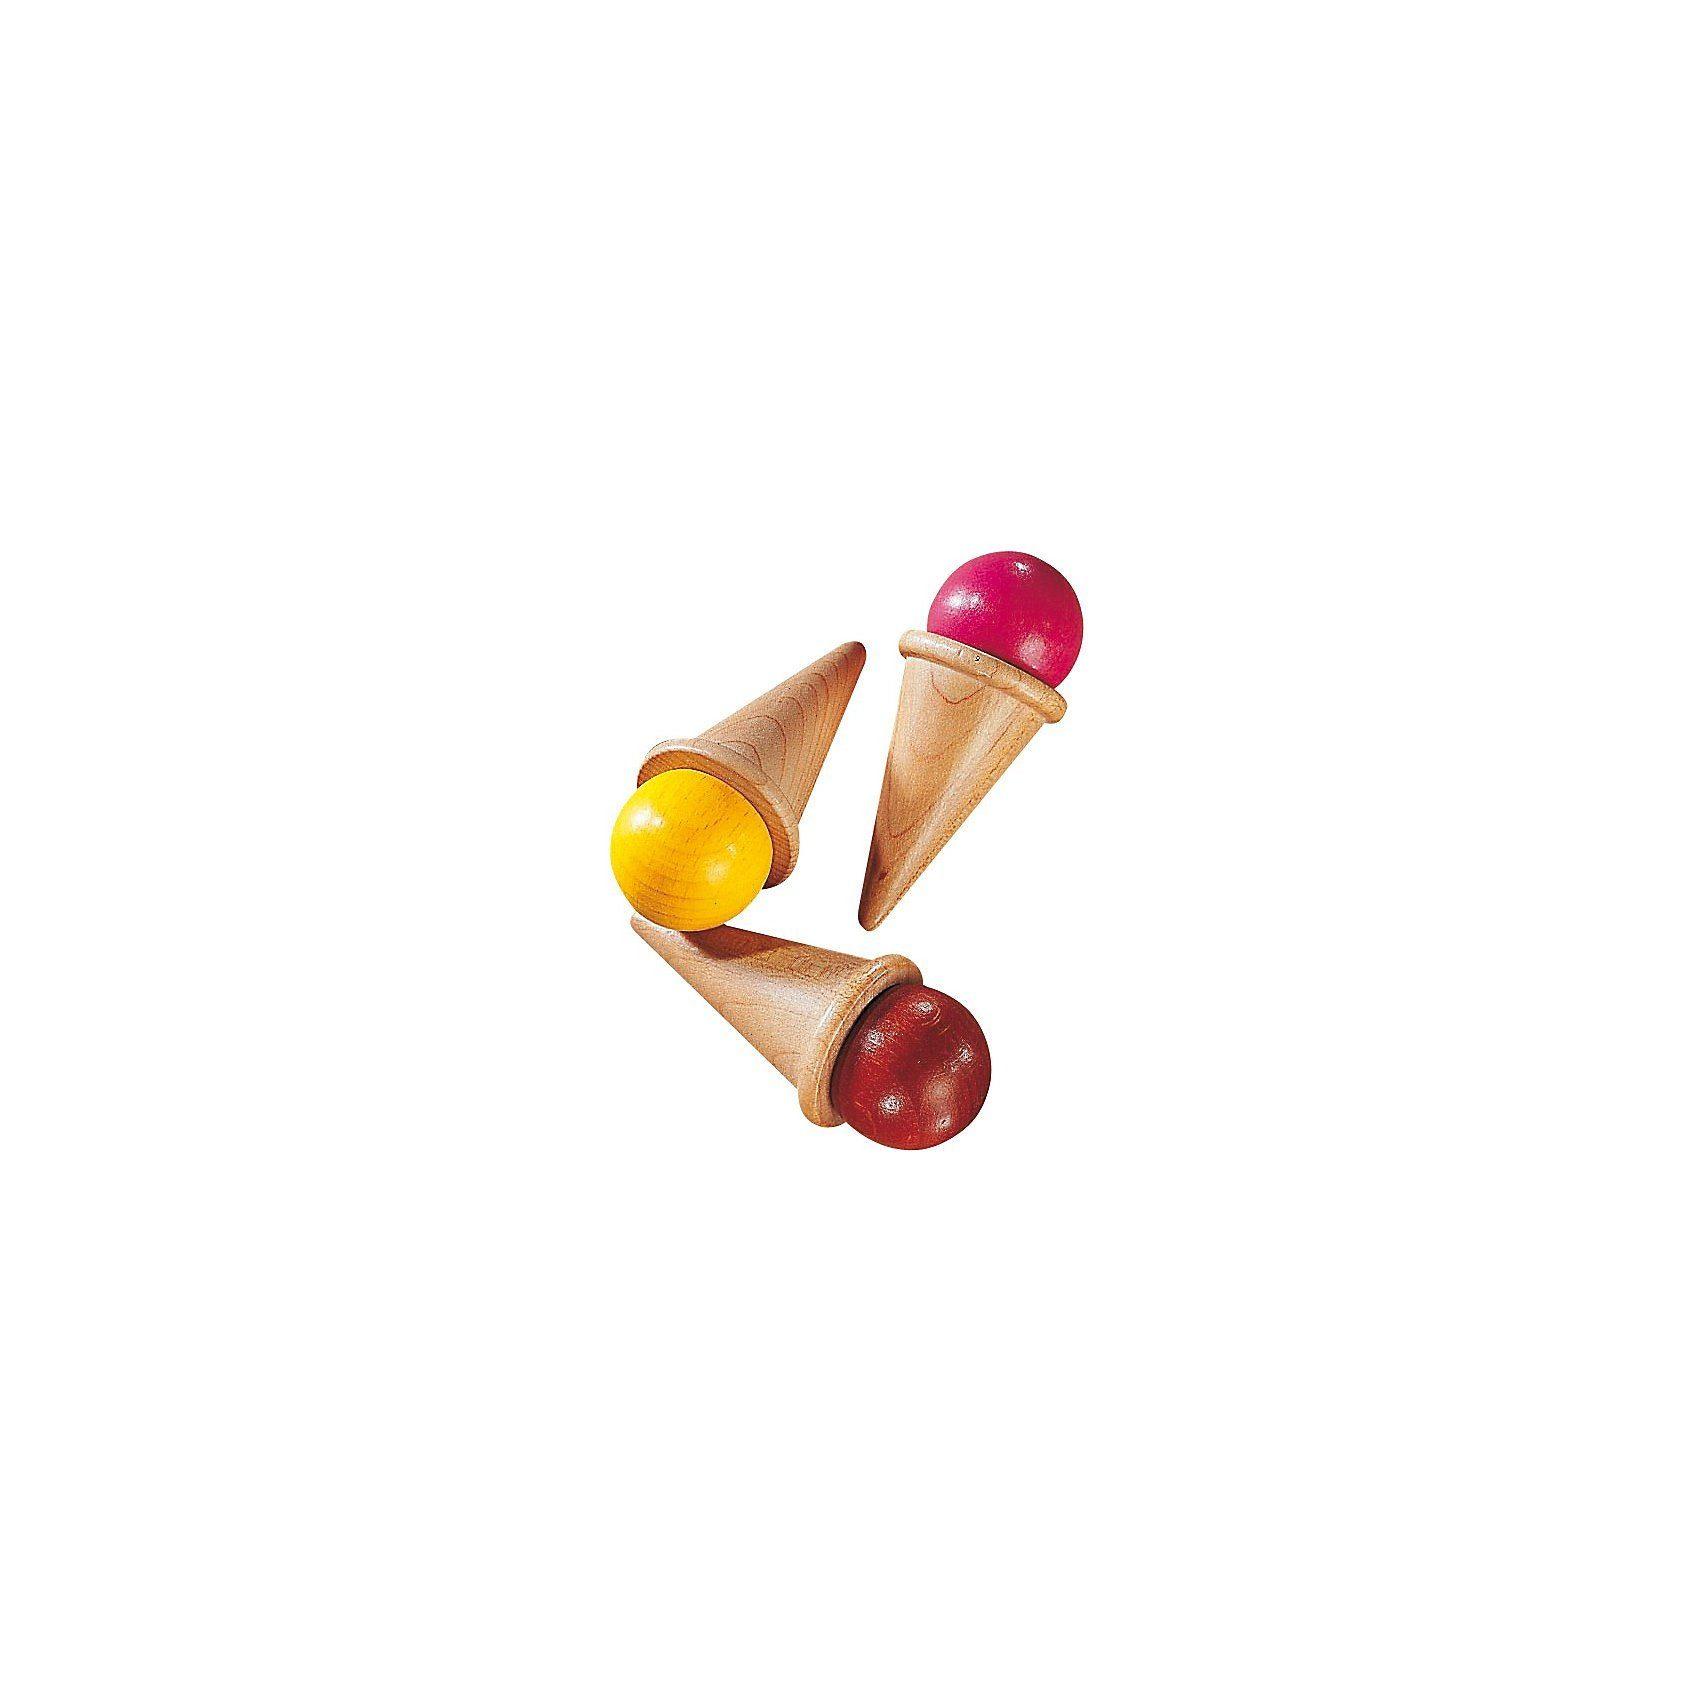 Haba 7988 Eistüten-Set Spiellebensmittel